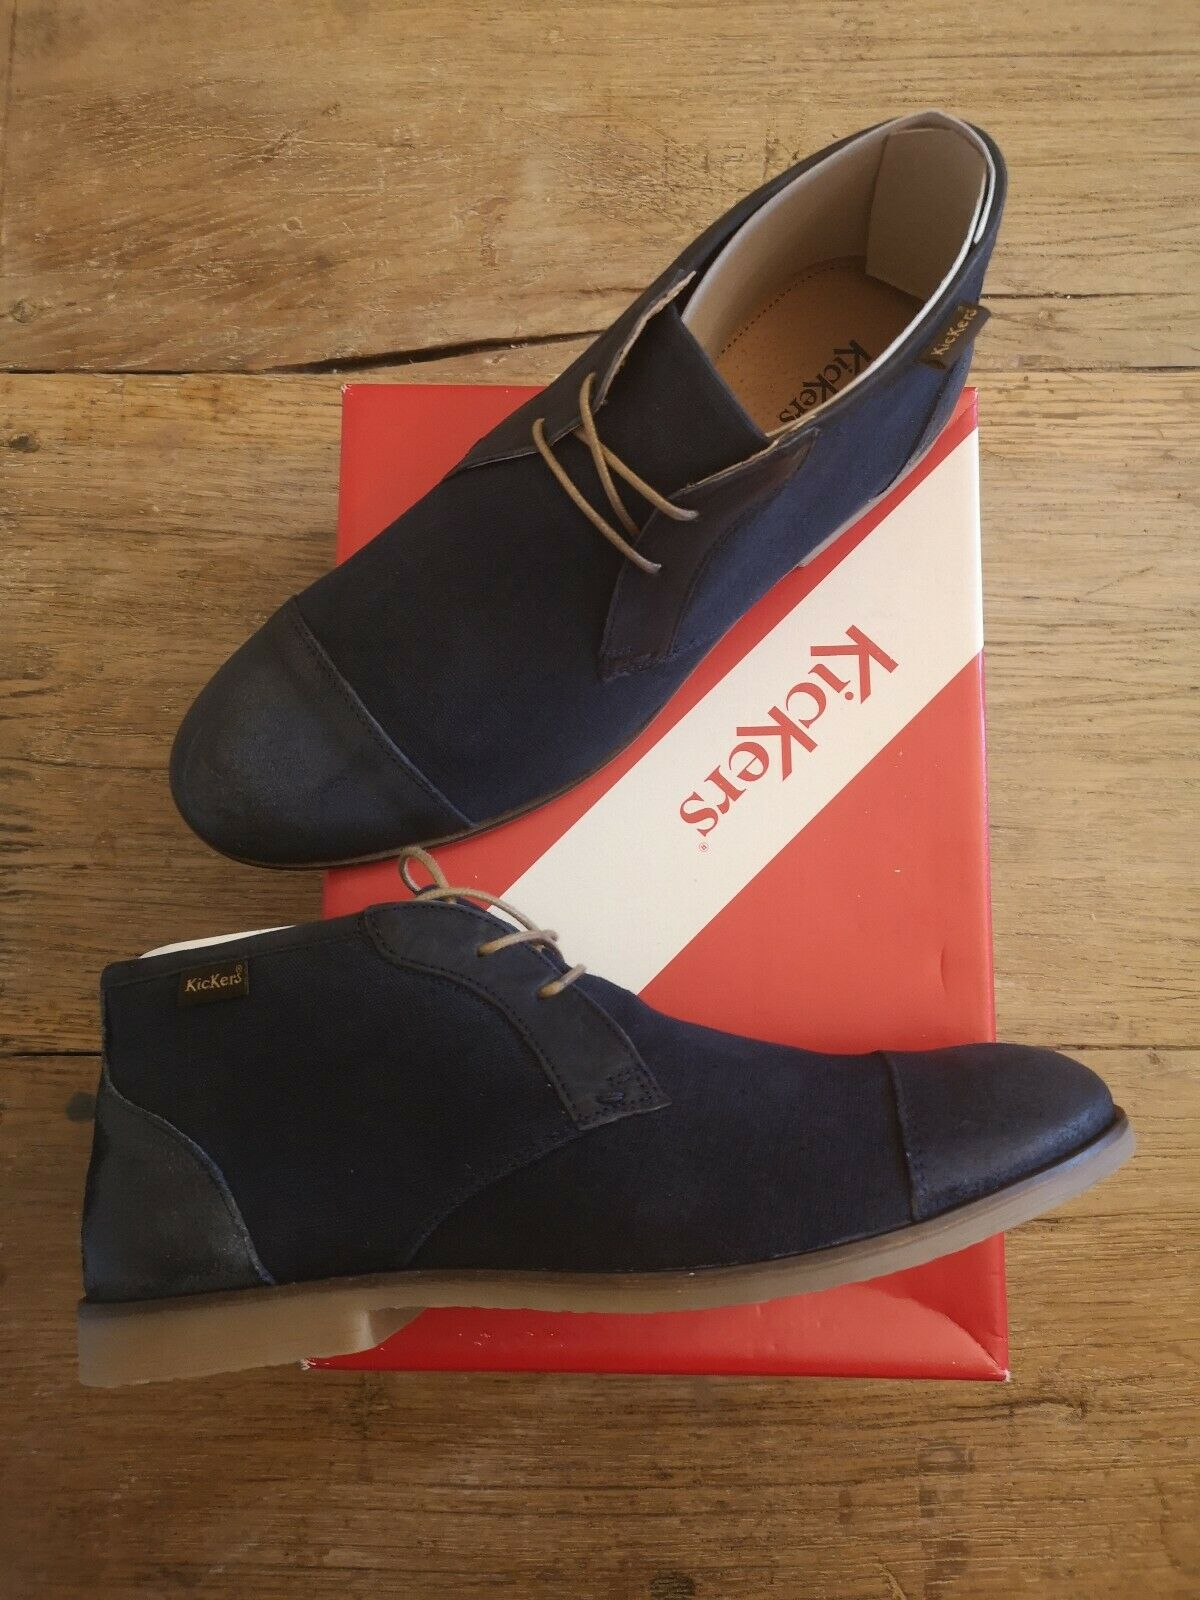 e5ae7e66071036 Chaussures Flagiansar Kickers, Bottines Classiques Homme T 43 ...